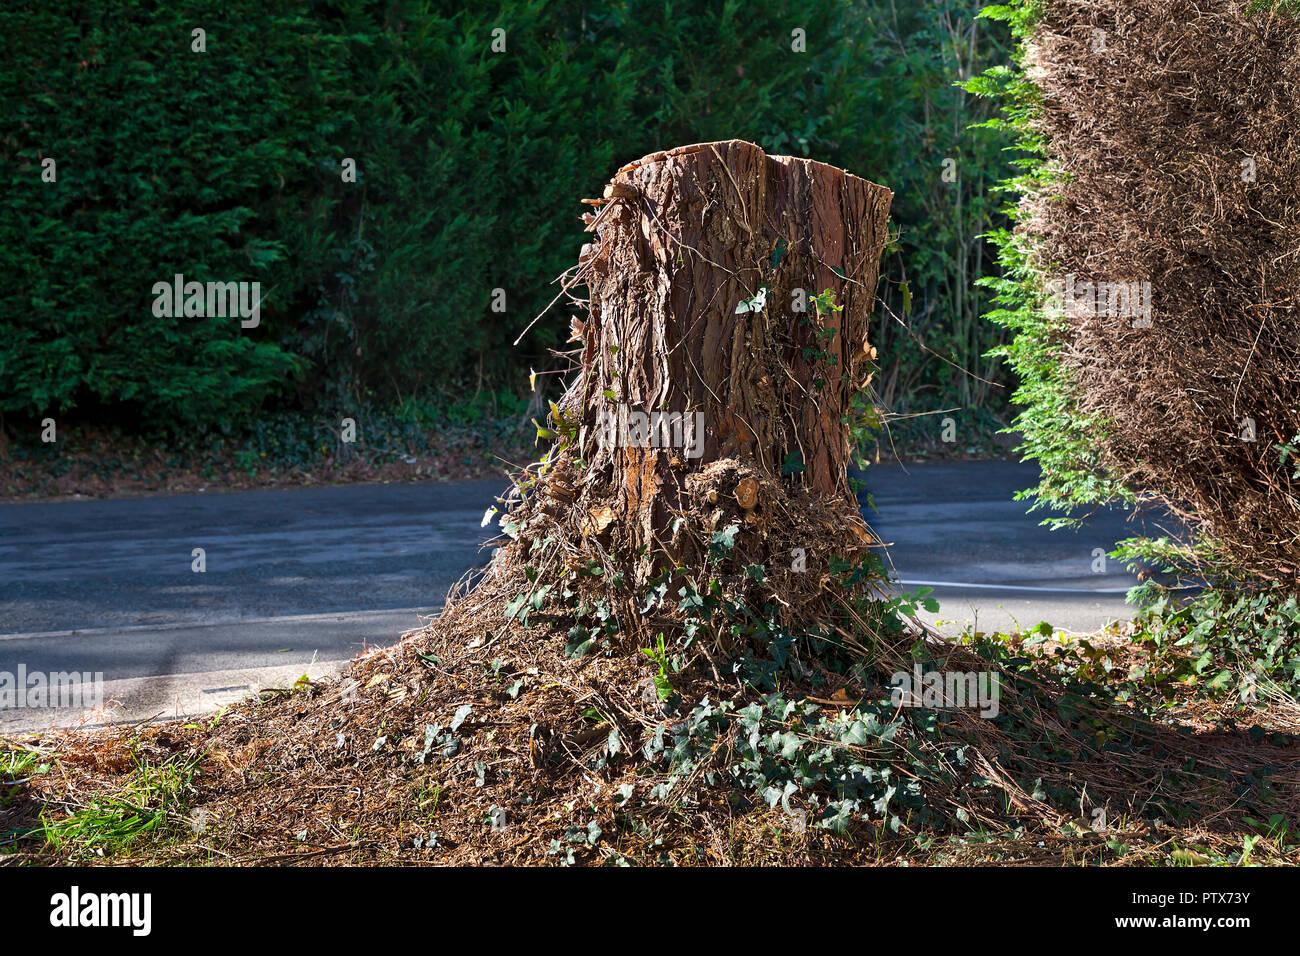 Conifer tree stump in garden - Stock Image